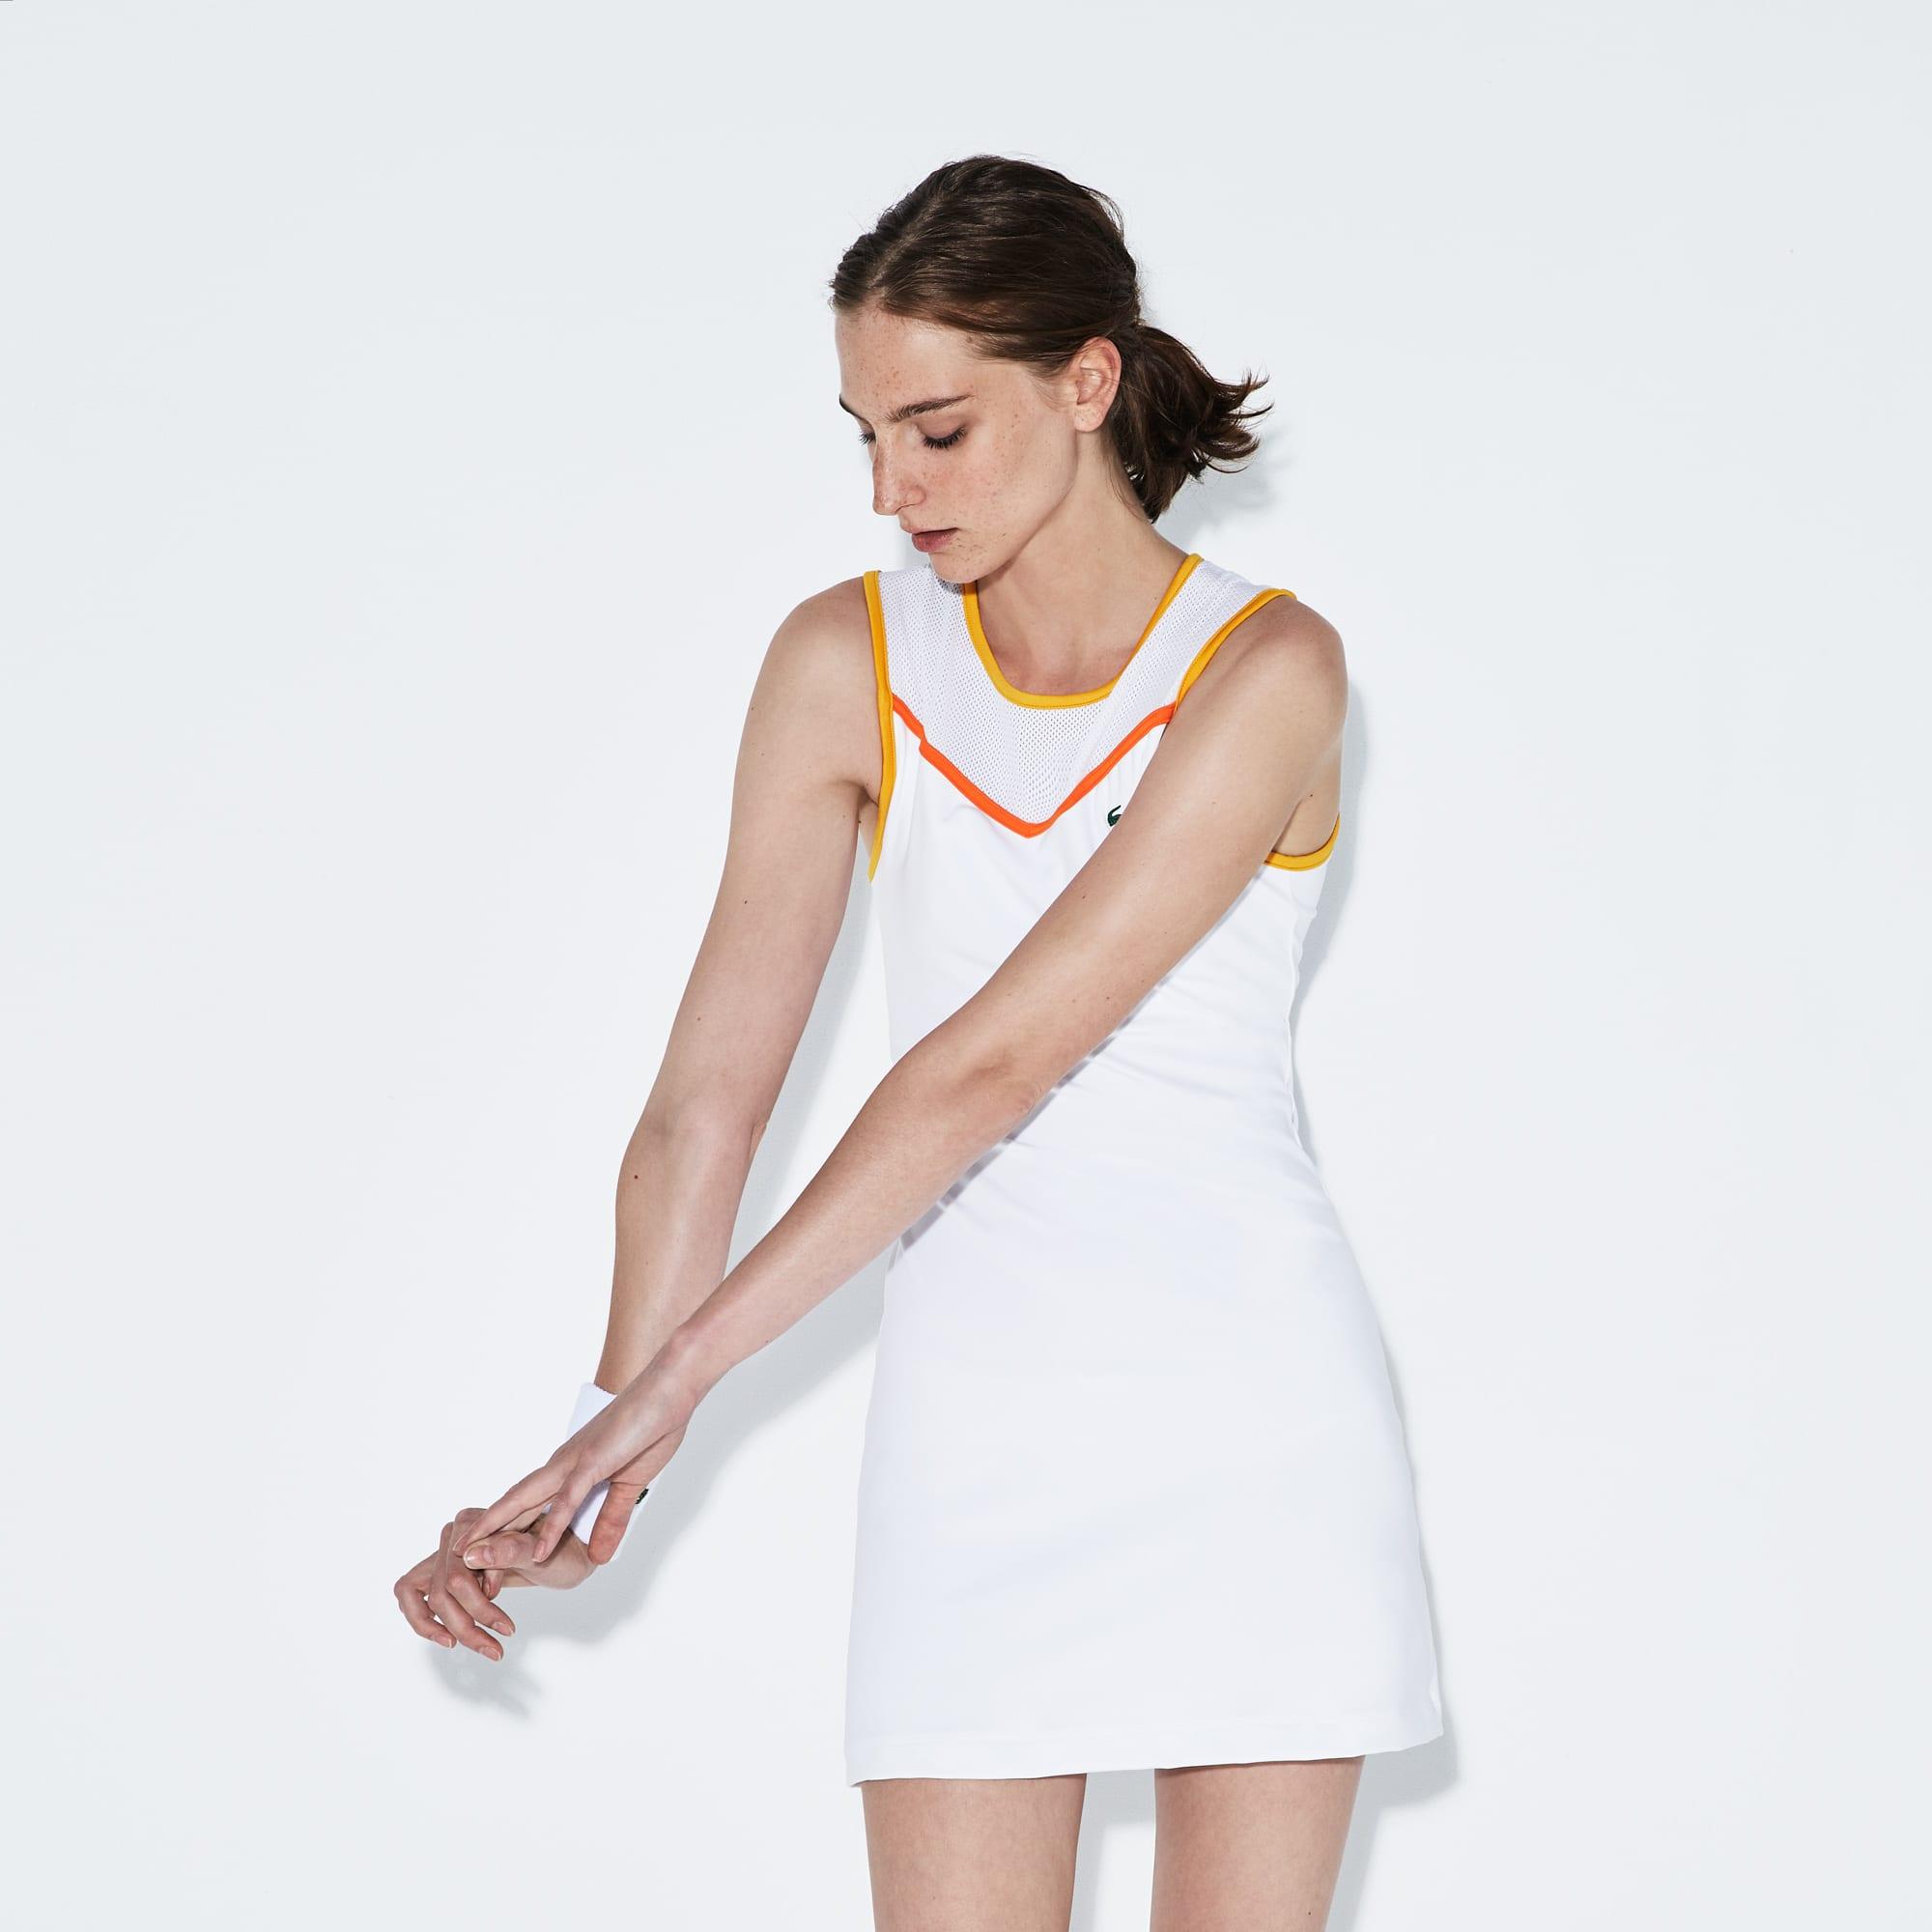 Women's Lacoste SPORT Tech Jersey And Mesh Racerback Tennis Dress